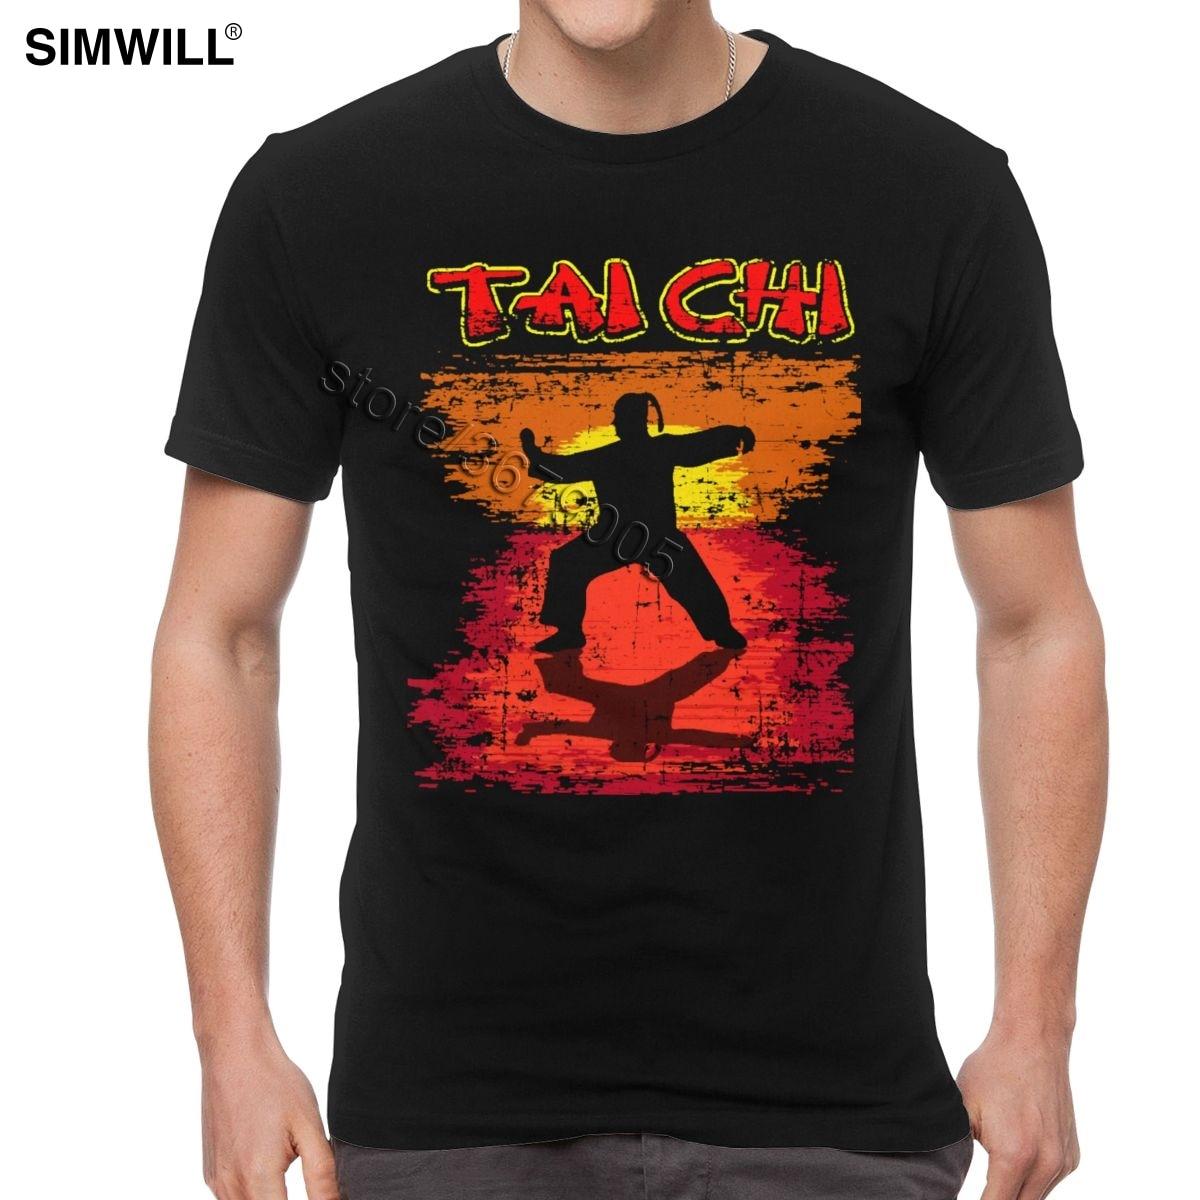 Ретро Мужская хлопковая футболка Tai Chi Chuan с короткими рукавами Taiji Quan, китайская футболка с изображением кунг фу, футболка для фанатов, одежда